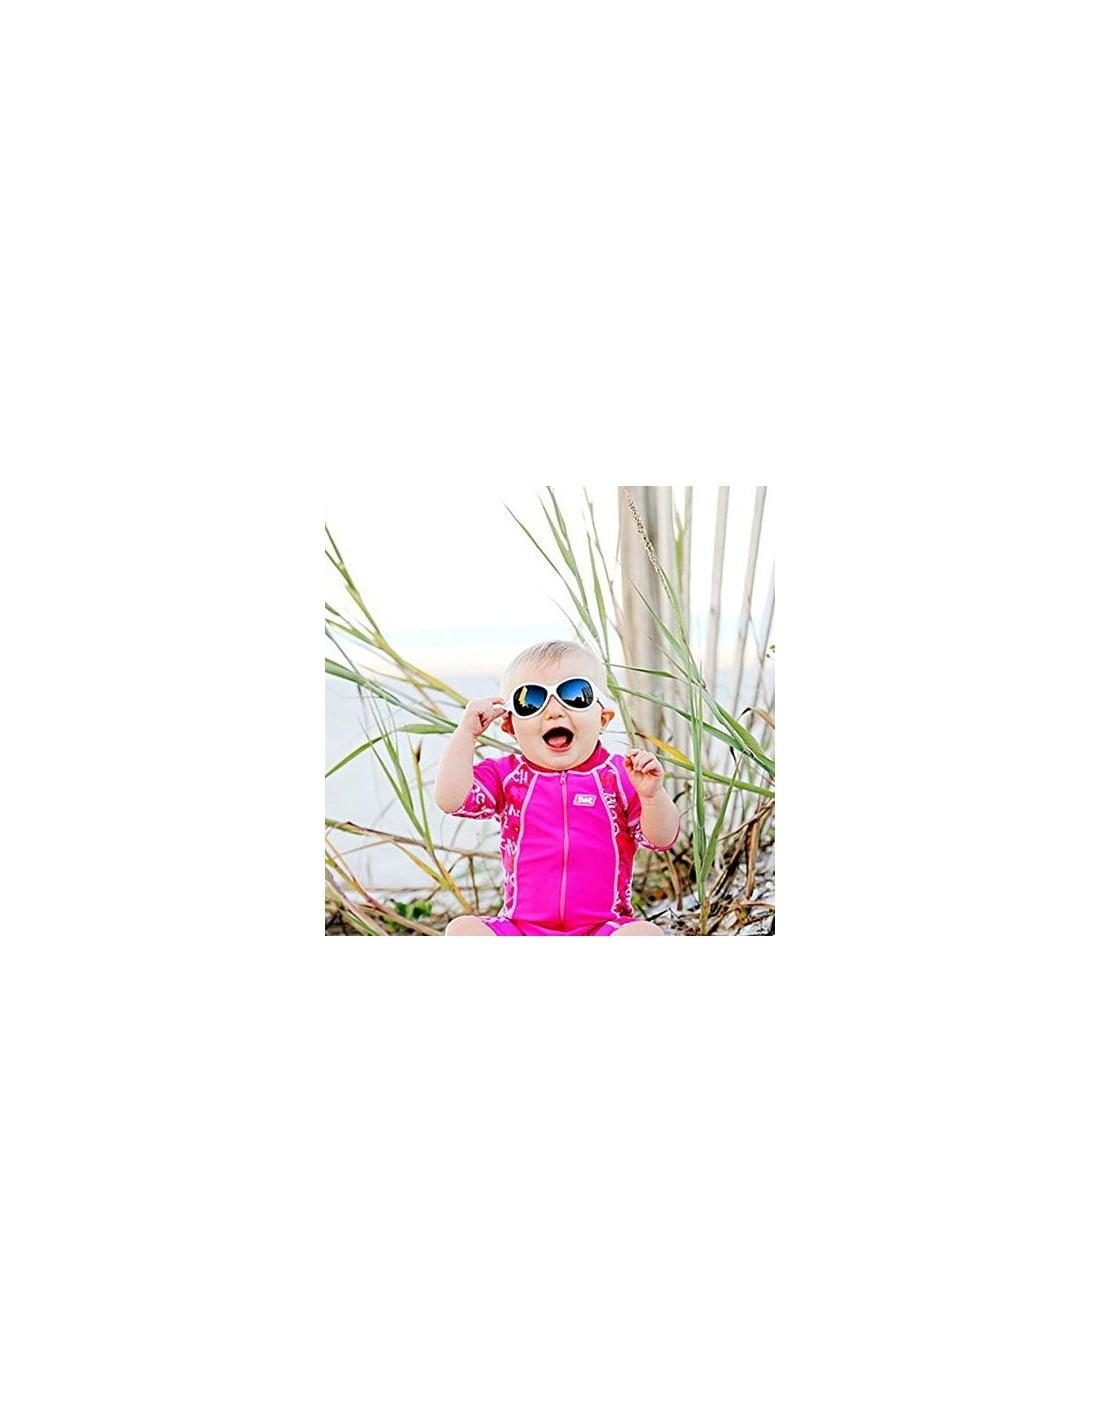 Ochelari de soare Bebe 0-2 ani Retro Oval Pink Banz 3